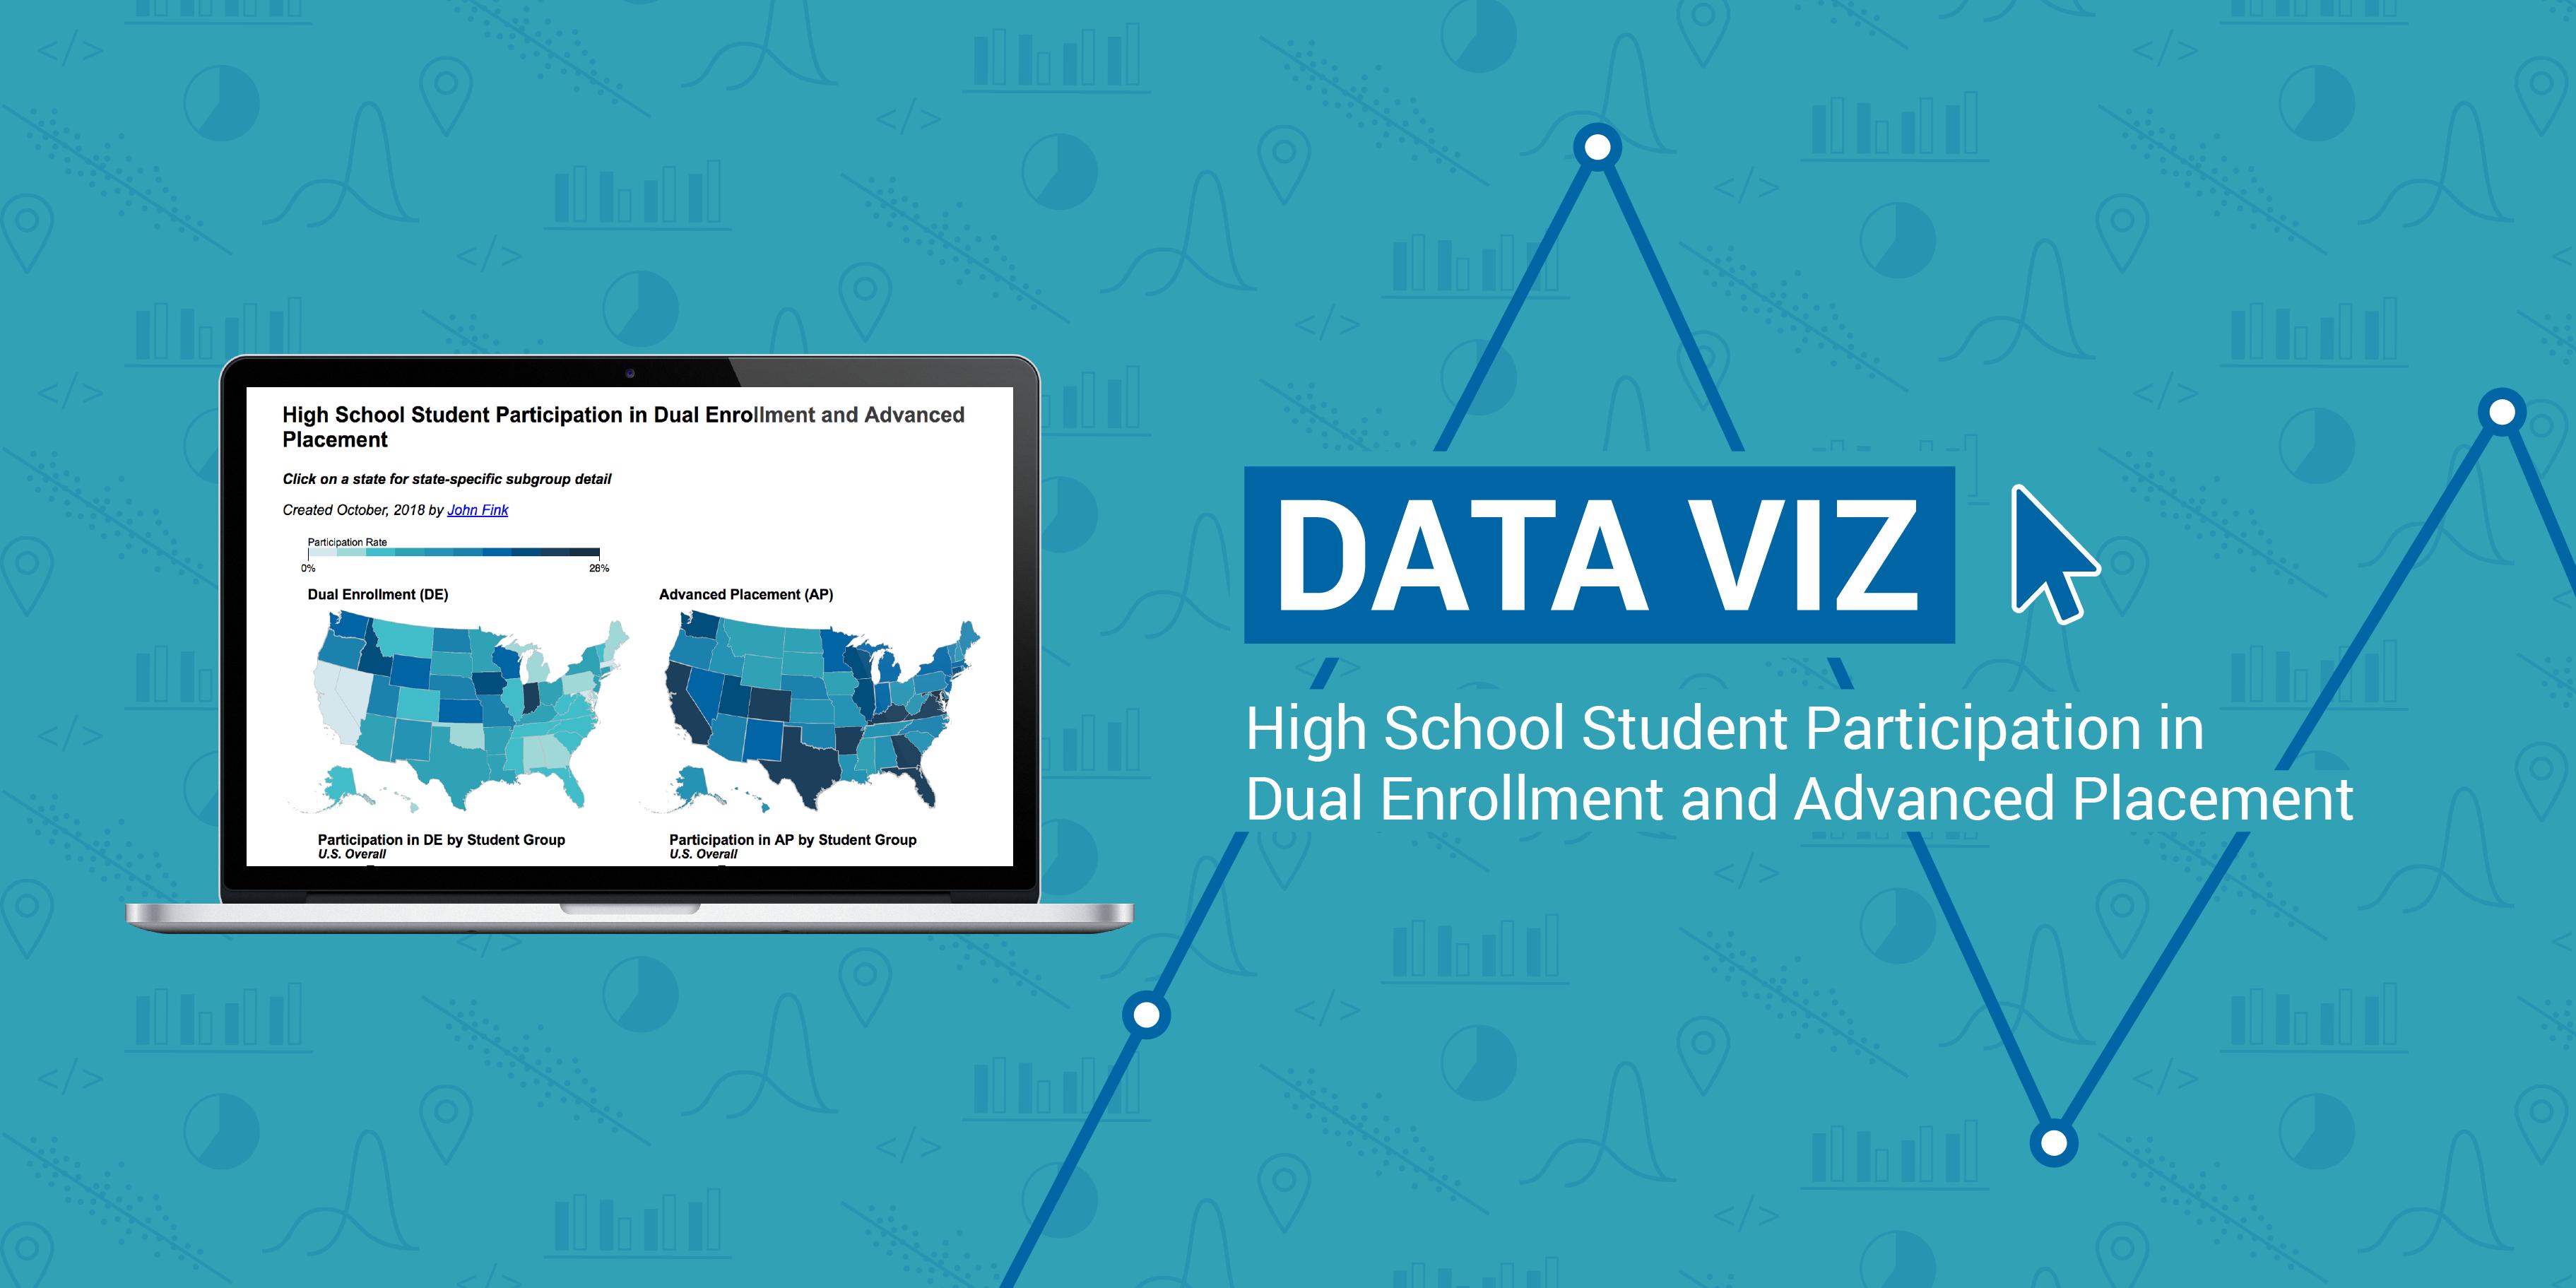 data-viz-access-dual-enrollmen_20181102-192320_1